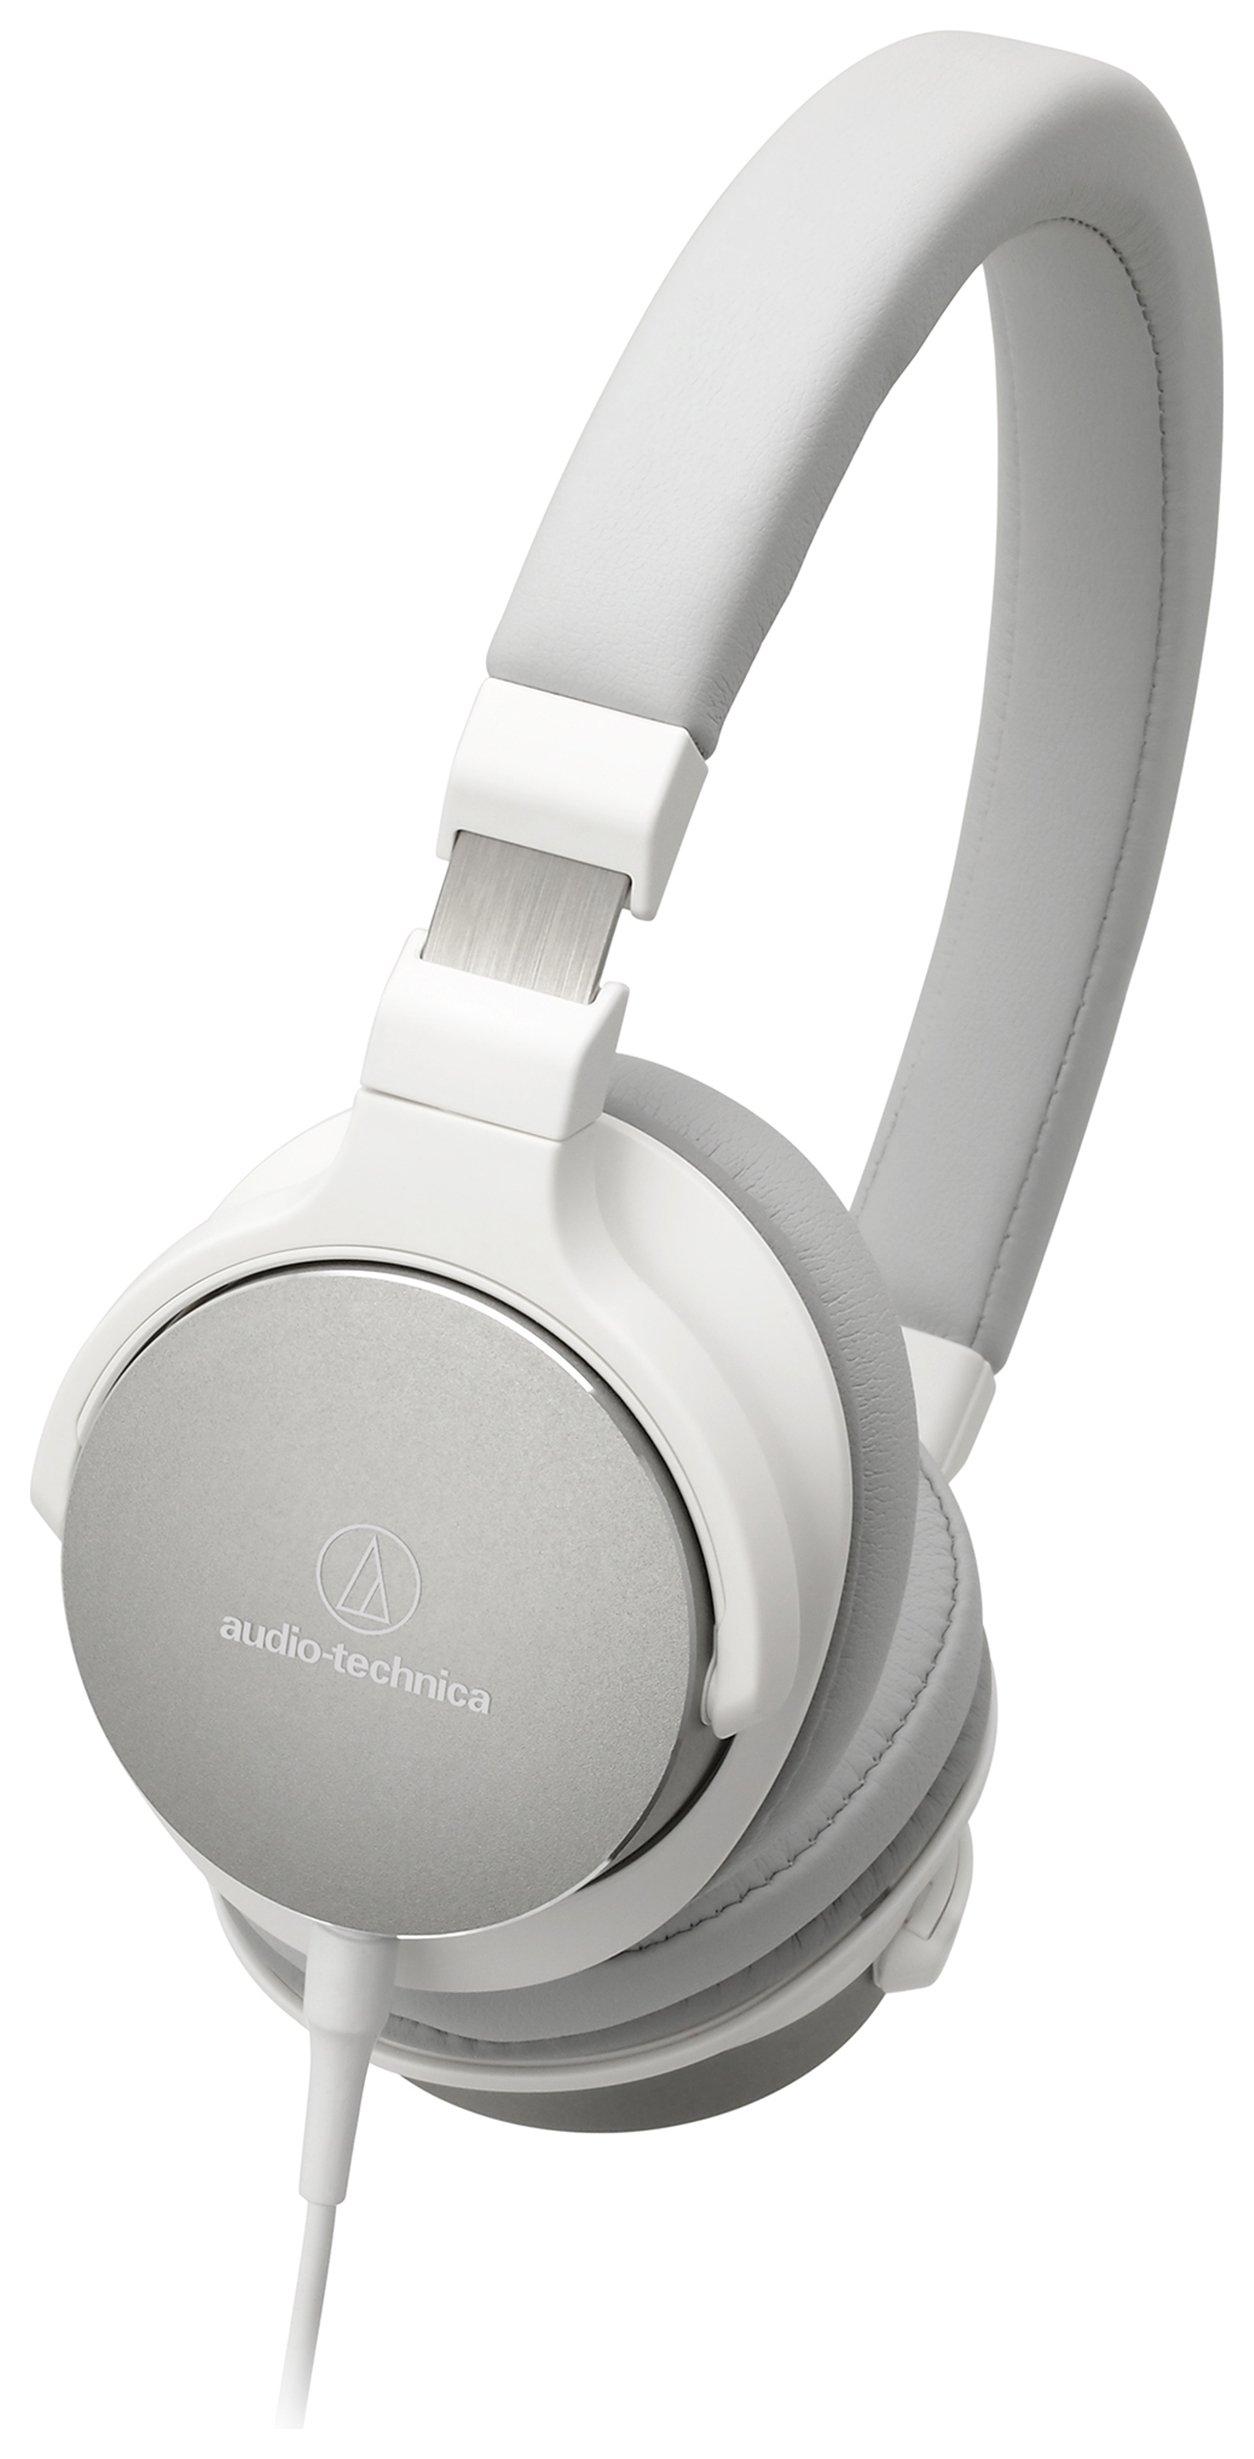 Audio Technica ATH-SR5 On-Ear Headphones - White.